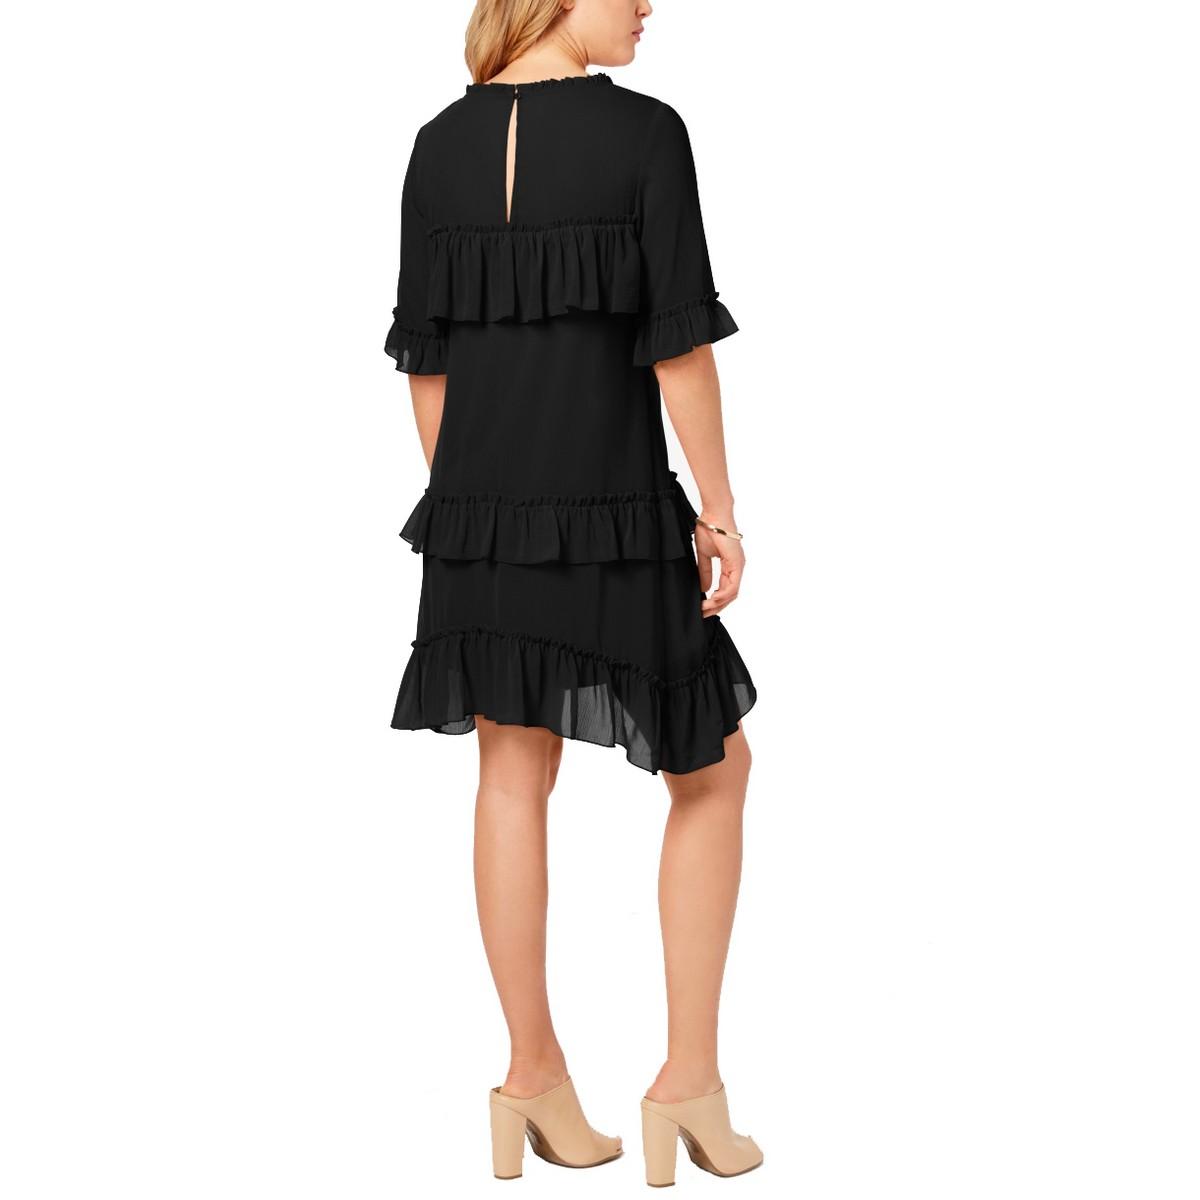 KENSIE-NEW-Women-039-s-Black-Ruffled-Chiffon-Fit-amp-Flare-Dress-TEDO thumbnail 4